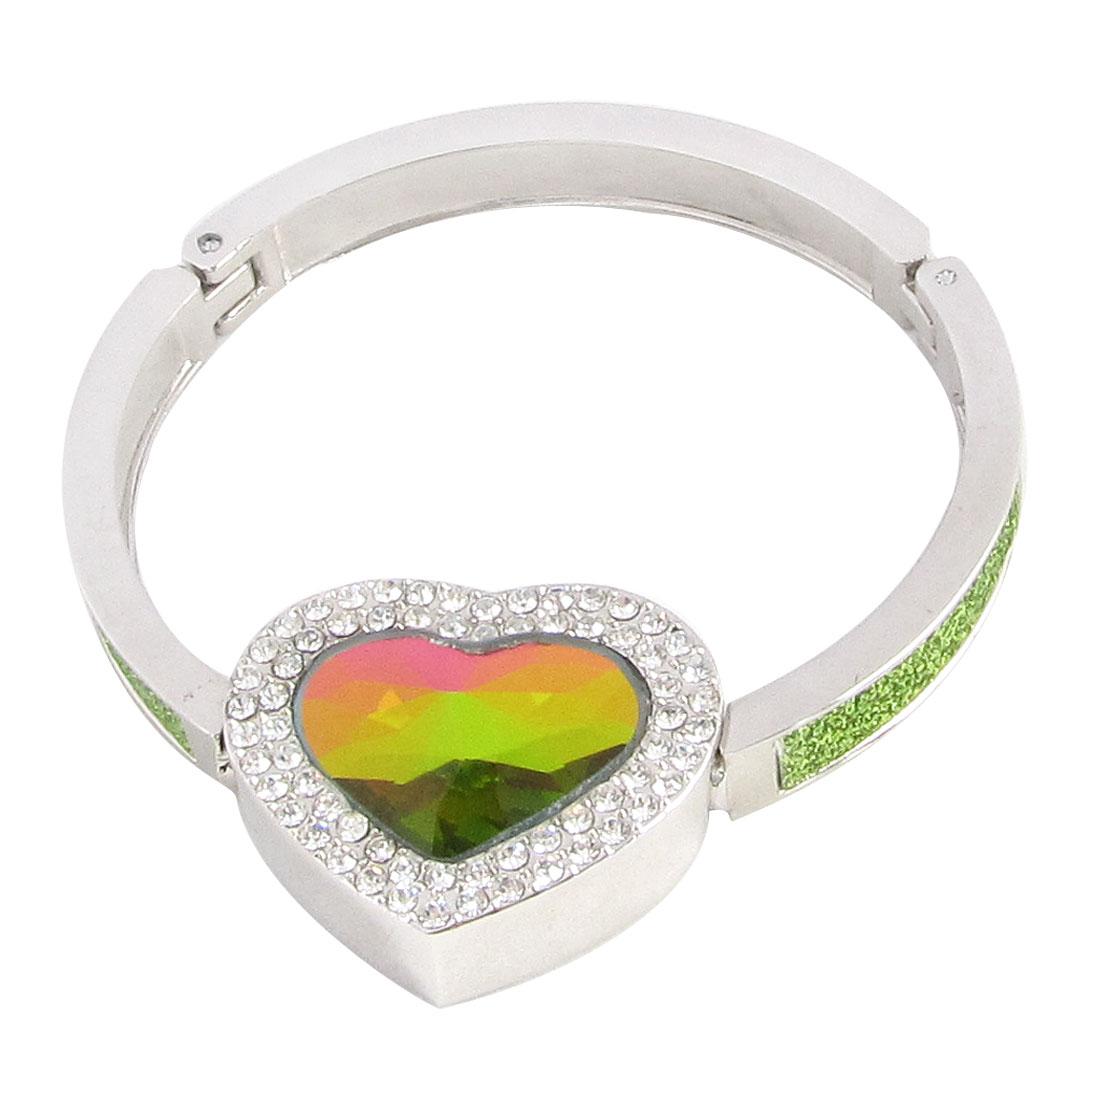 Faceted Heart Shape Crystal Detail Foldable Handbag Padlock Hook Green for Lady